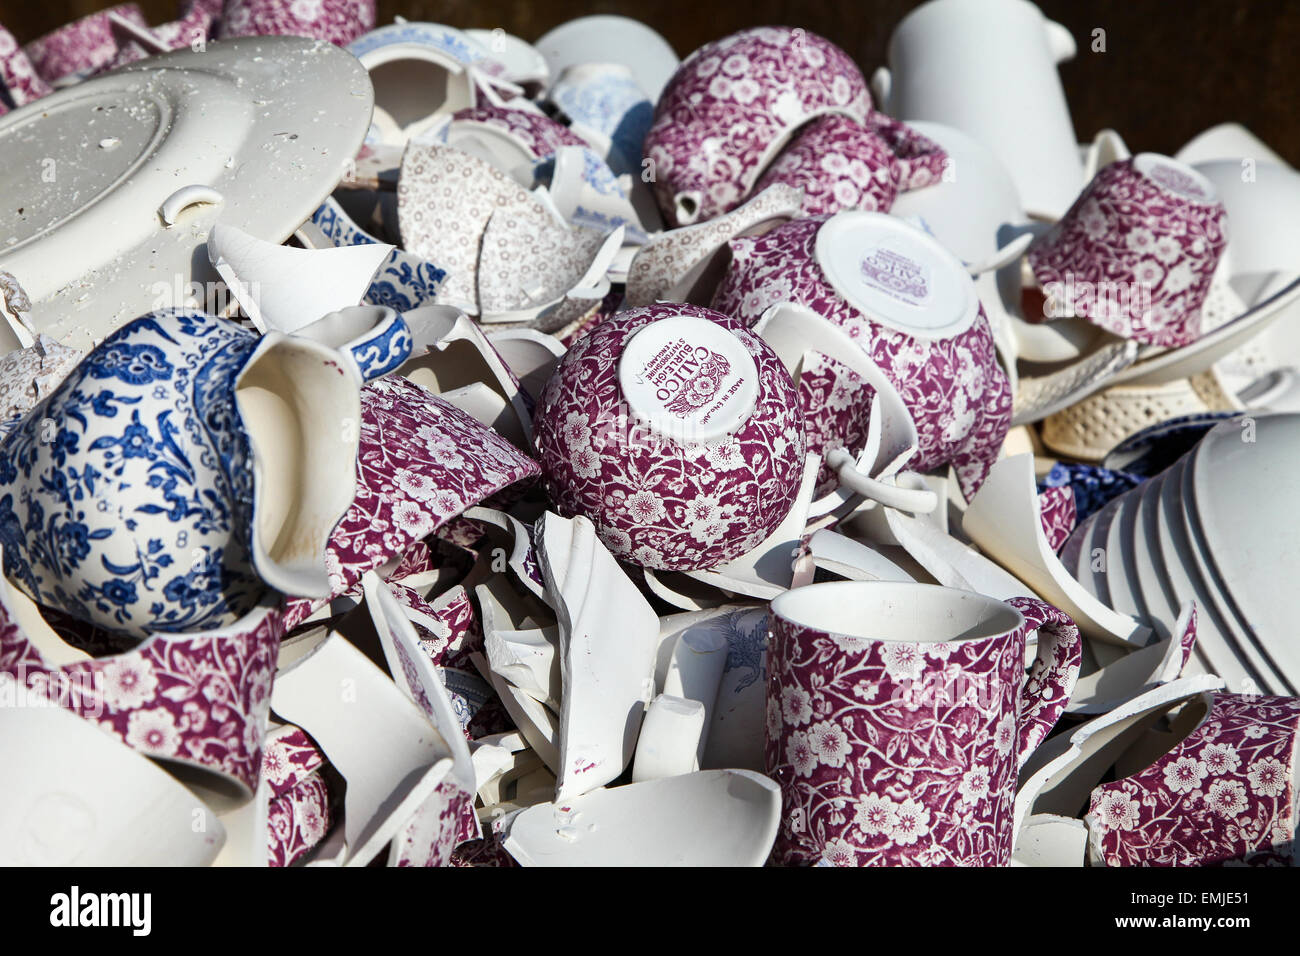 broken-rejected-pottery-at-burleigh-middleport-pottery-factory-stoke-EMJE51.jpg